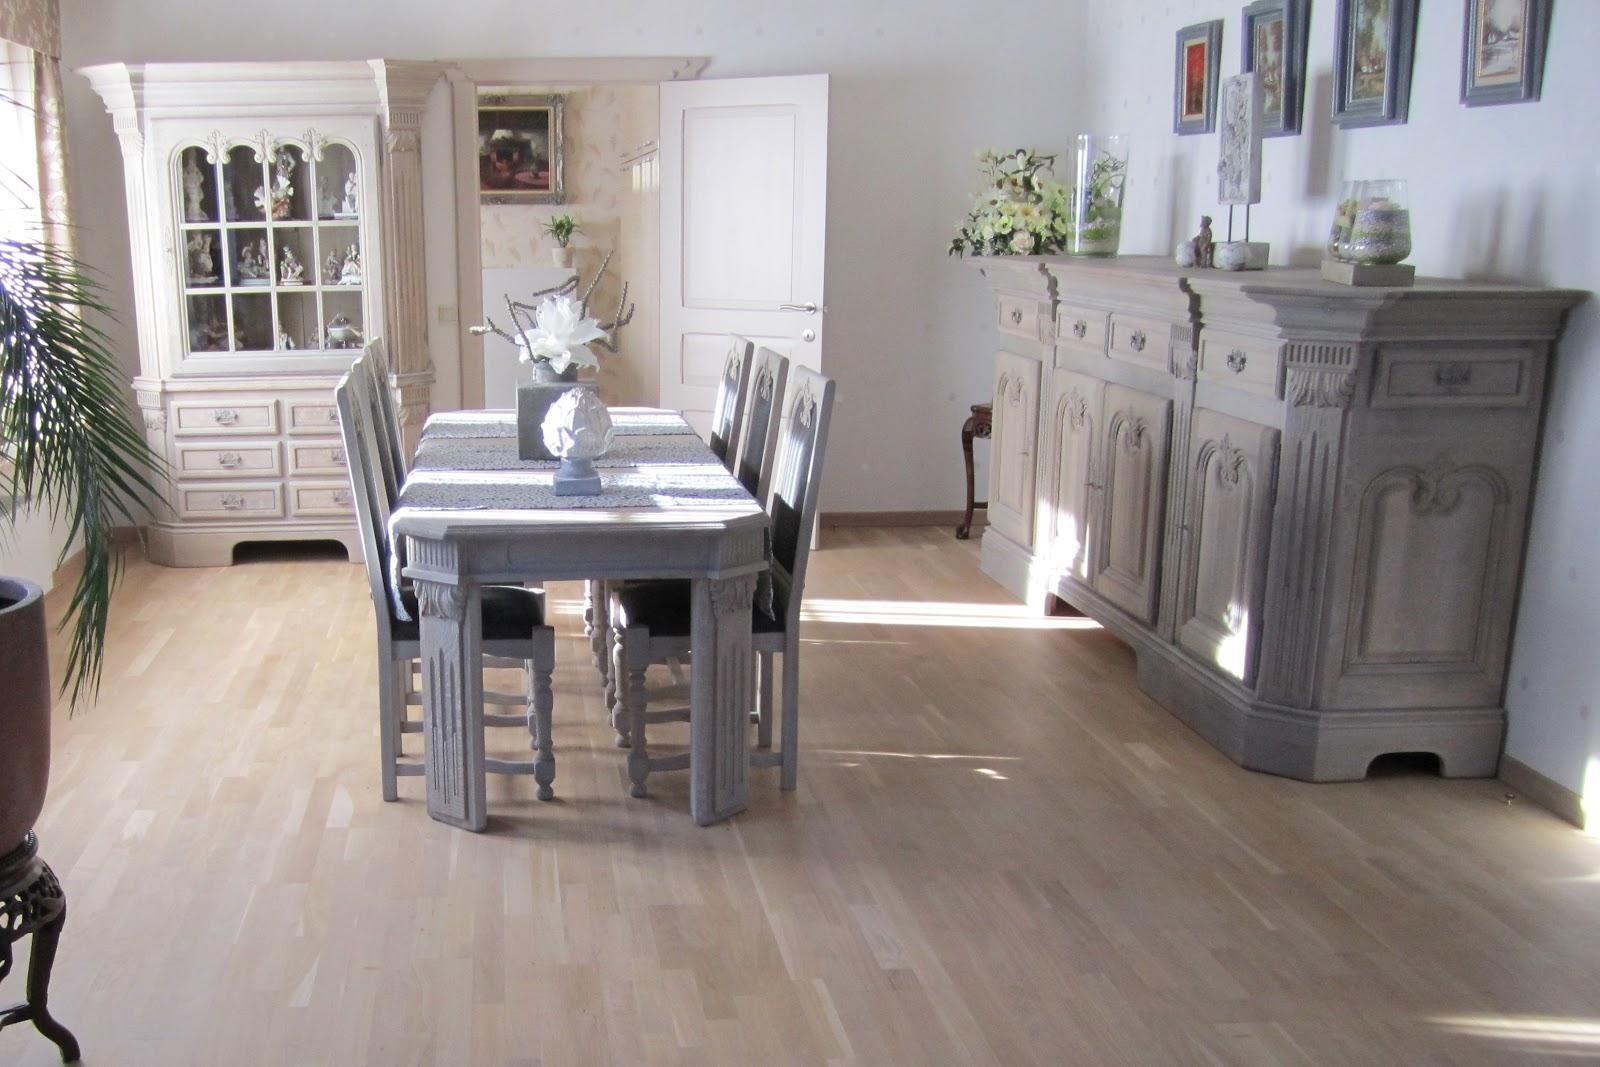 Eiken Keuken Laten Schilderen : Vernieuwen van eiken dressoir, vitrine, tafel en stoelen